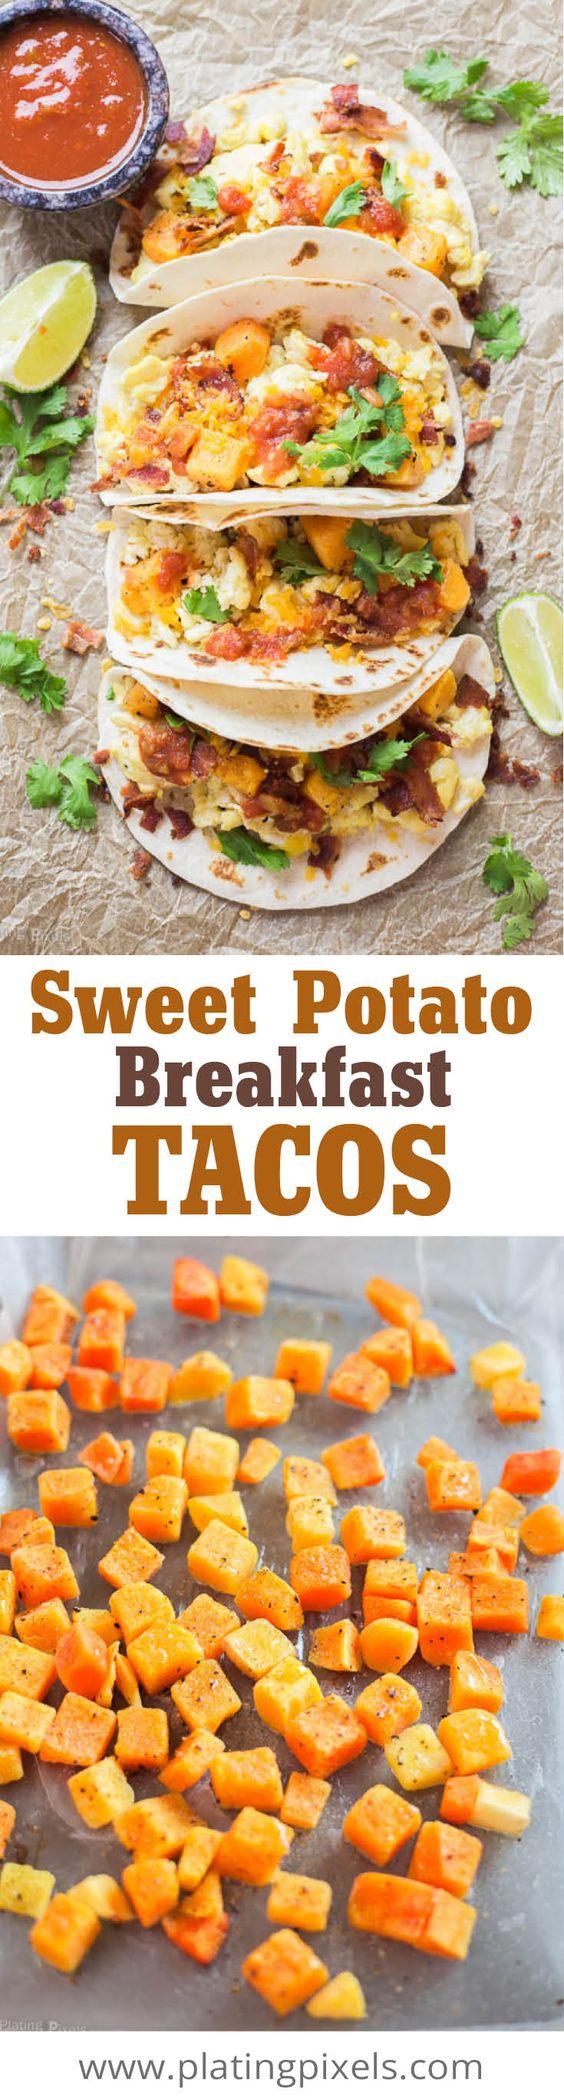 Breakfast tacos, Sweet potato breakfast and Tacos on Pinterest